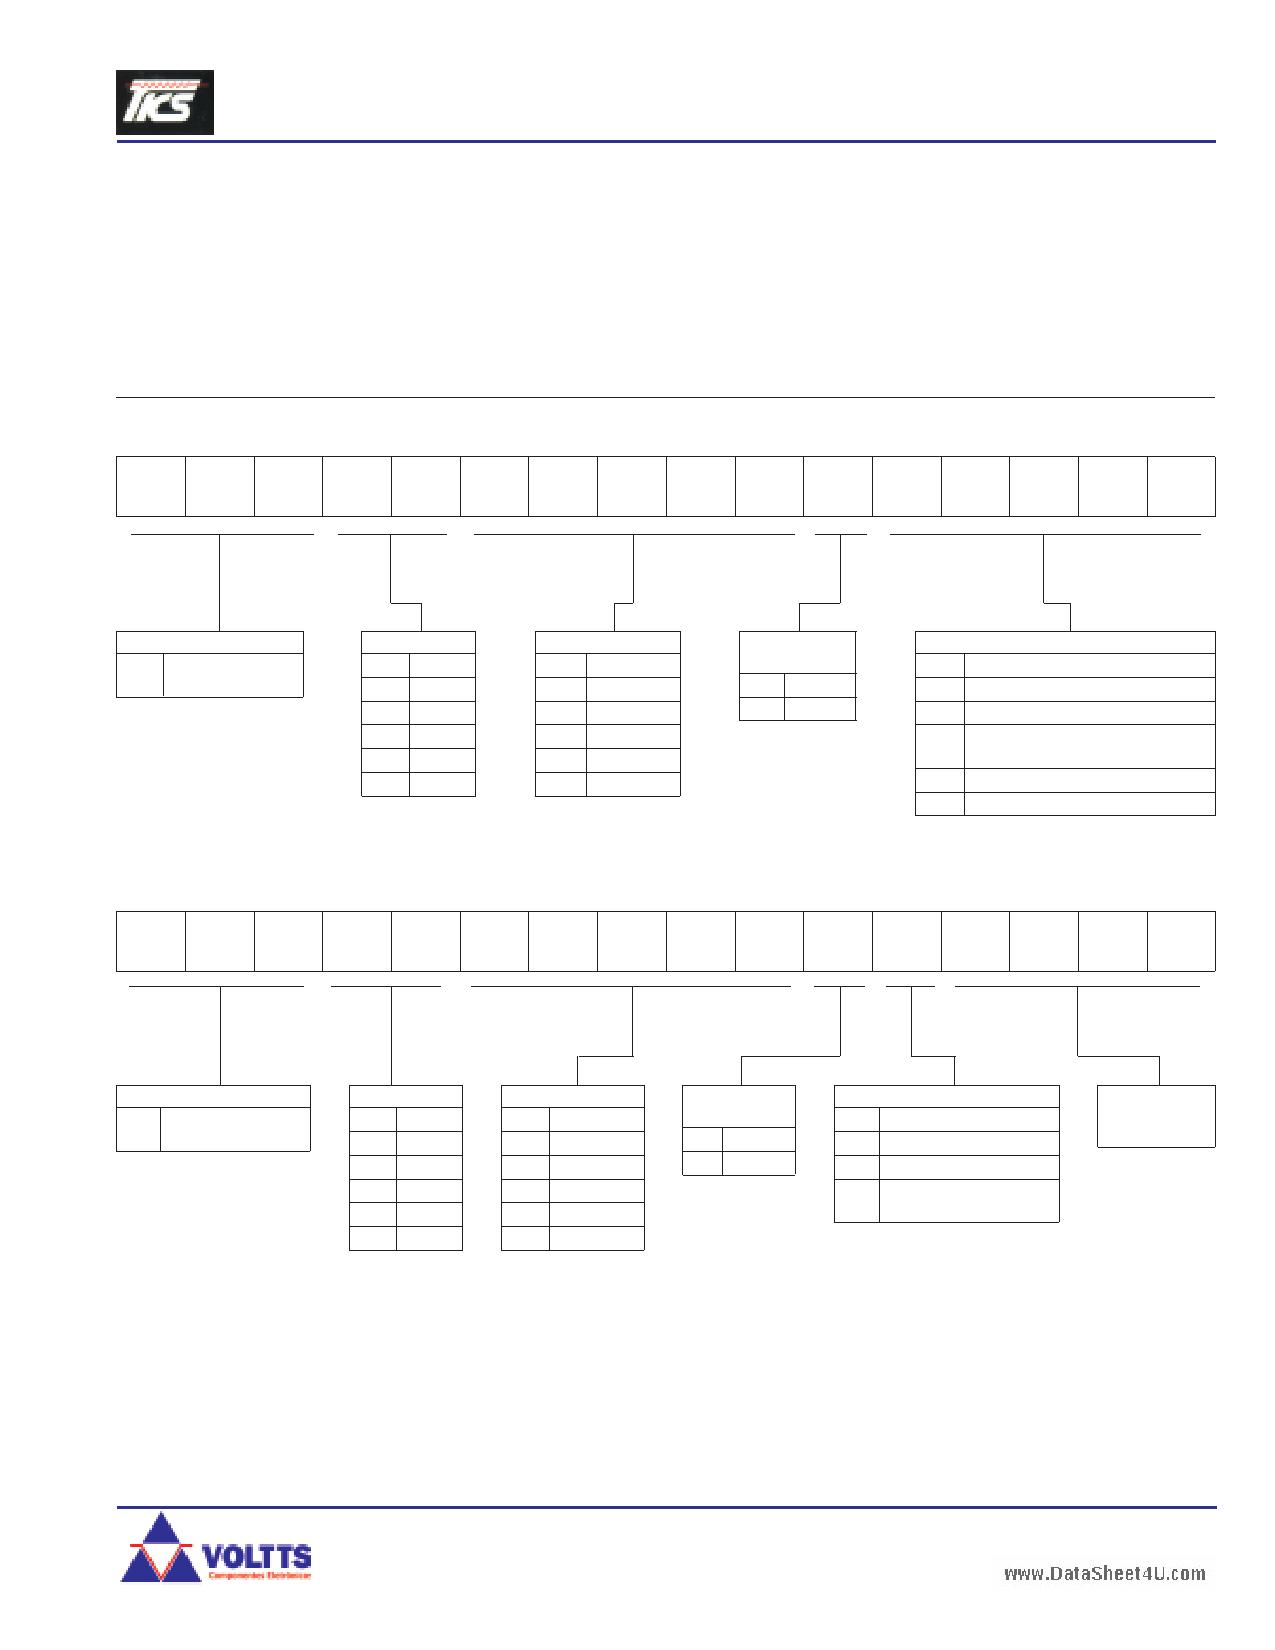 SCK-2R55A datasheet image